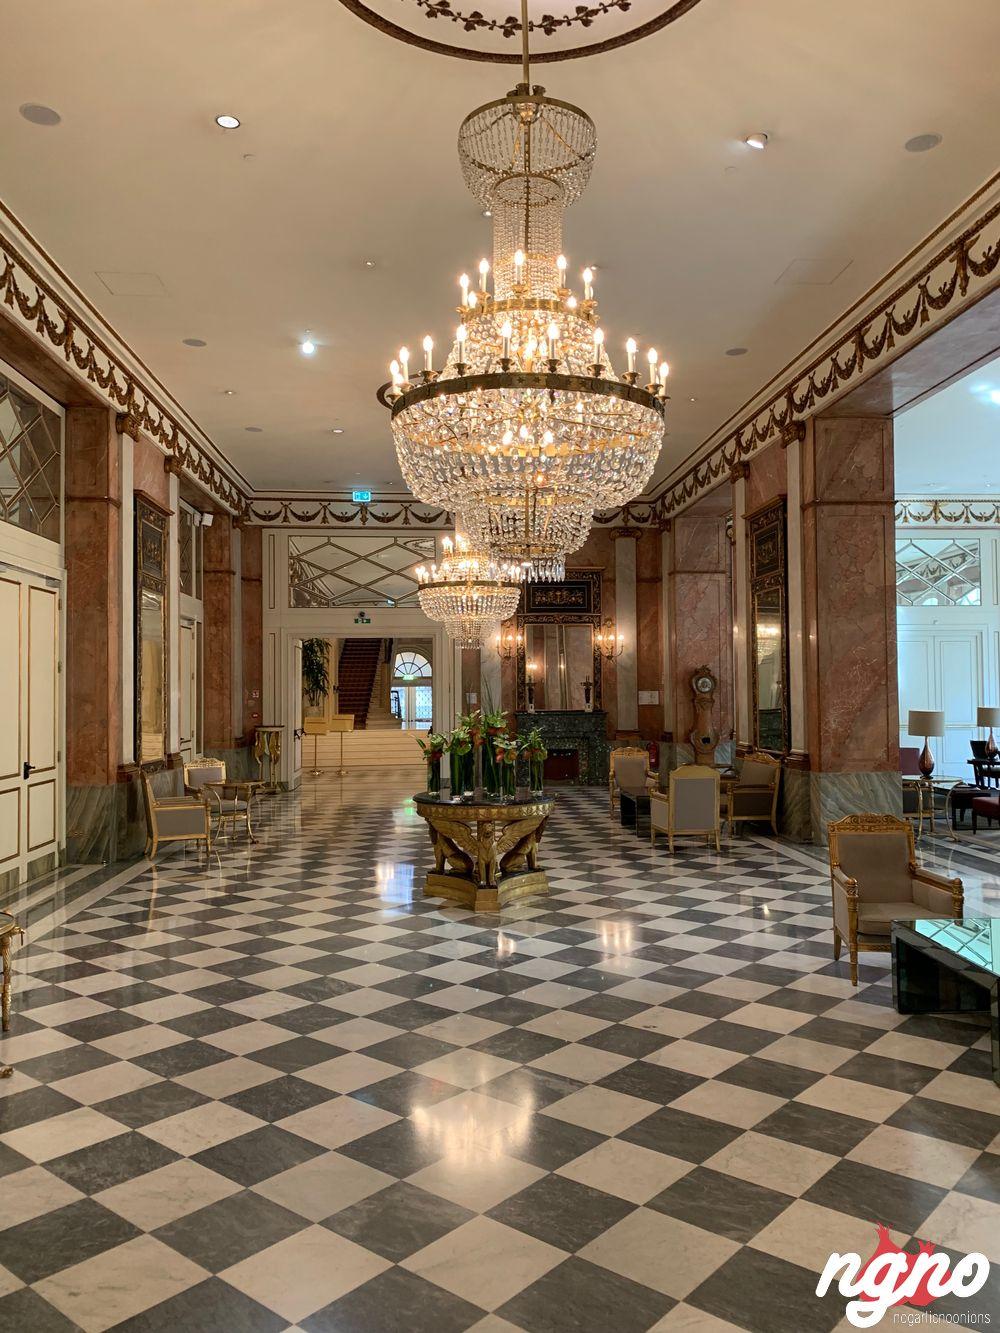 westin-hotel-roma-italia2019-01-06-05-50-12